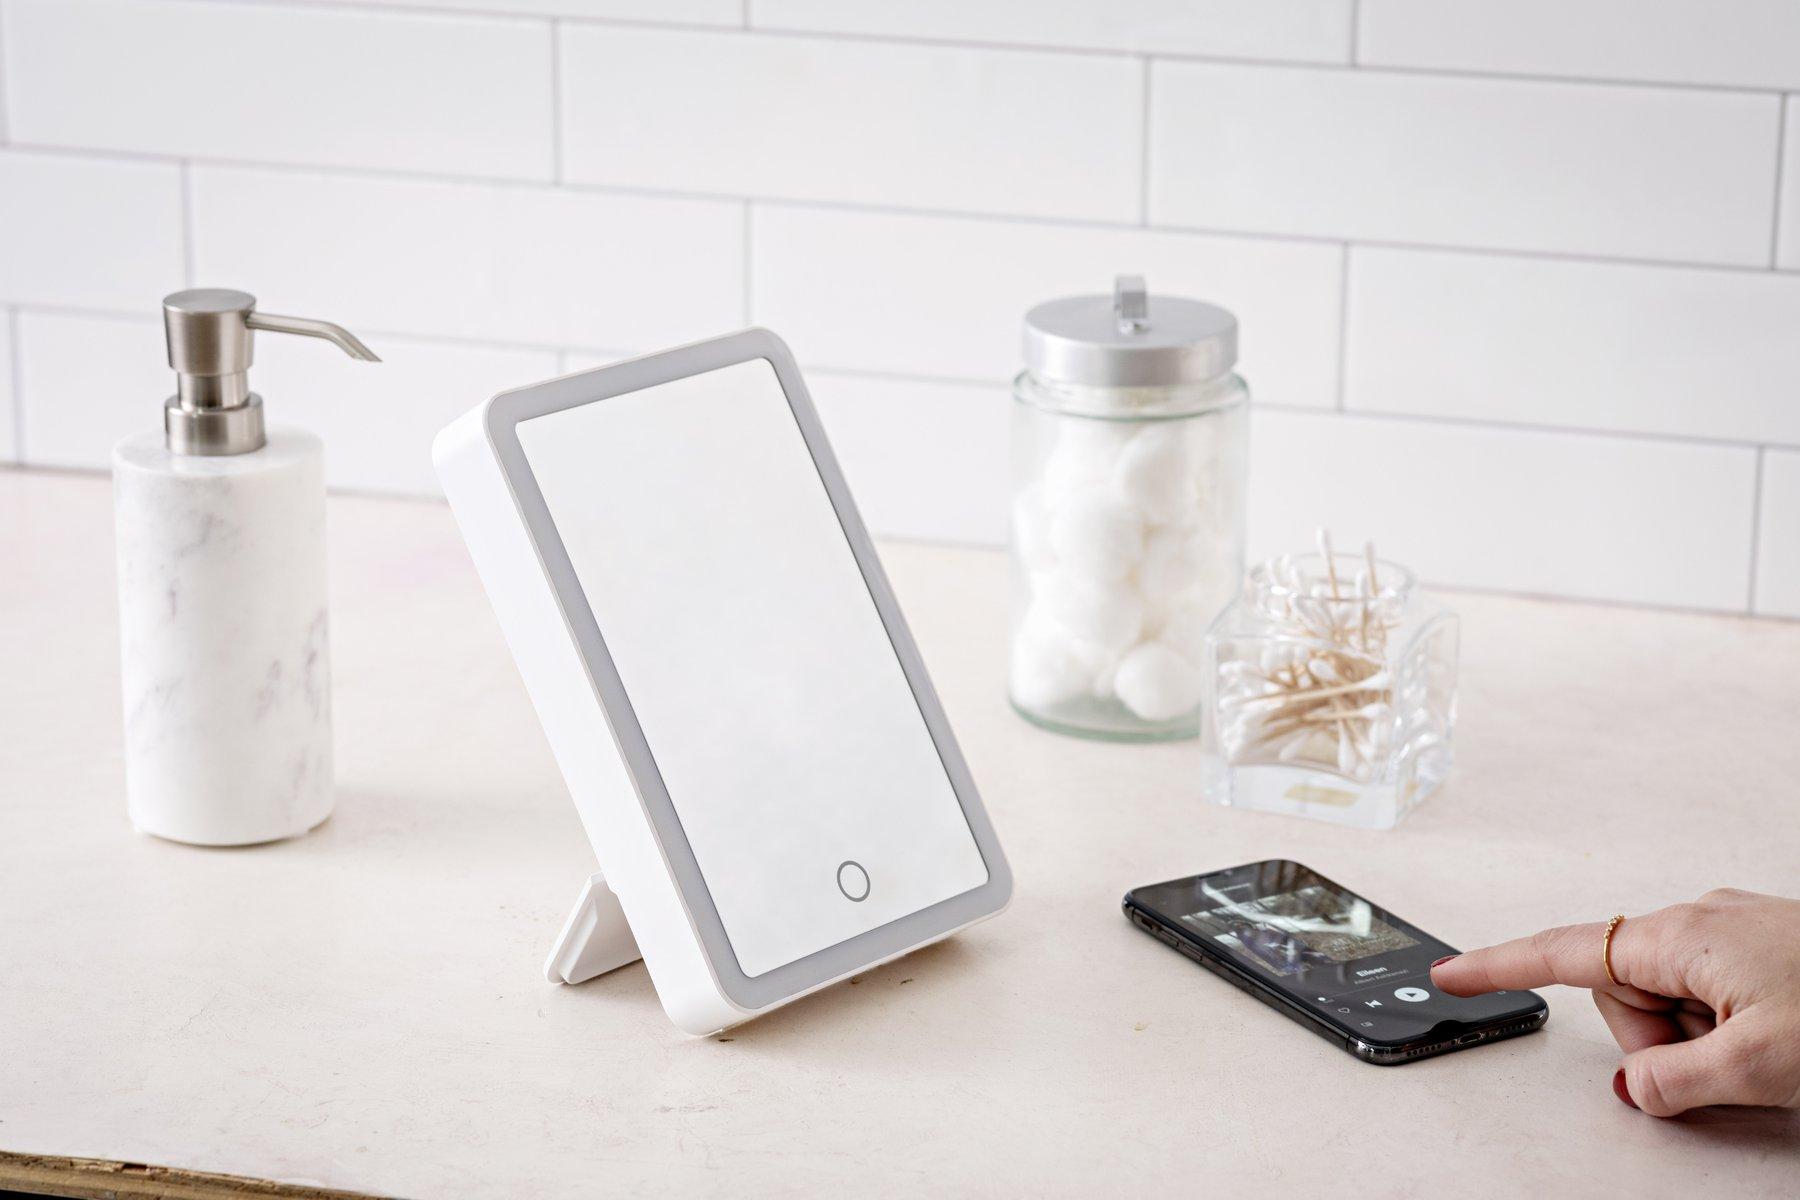 Ihome Portable Icvbt1 Portable Lighted Bluetooth Vanity Mirror